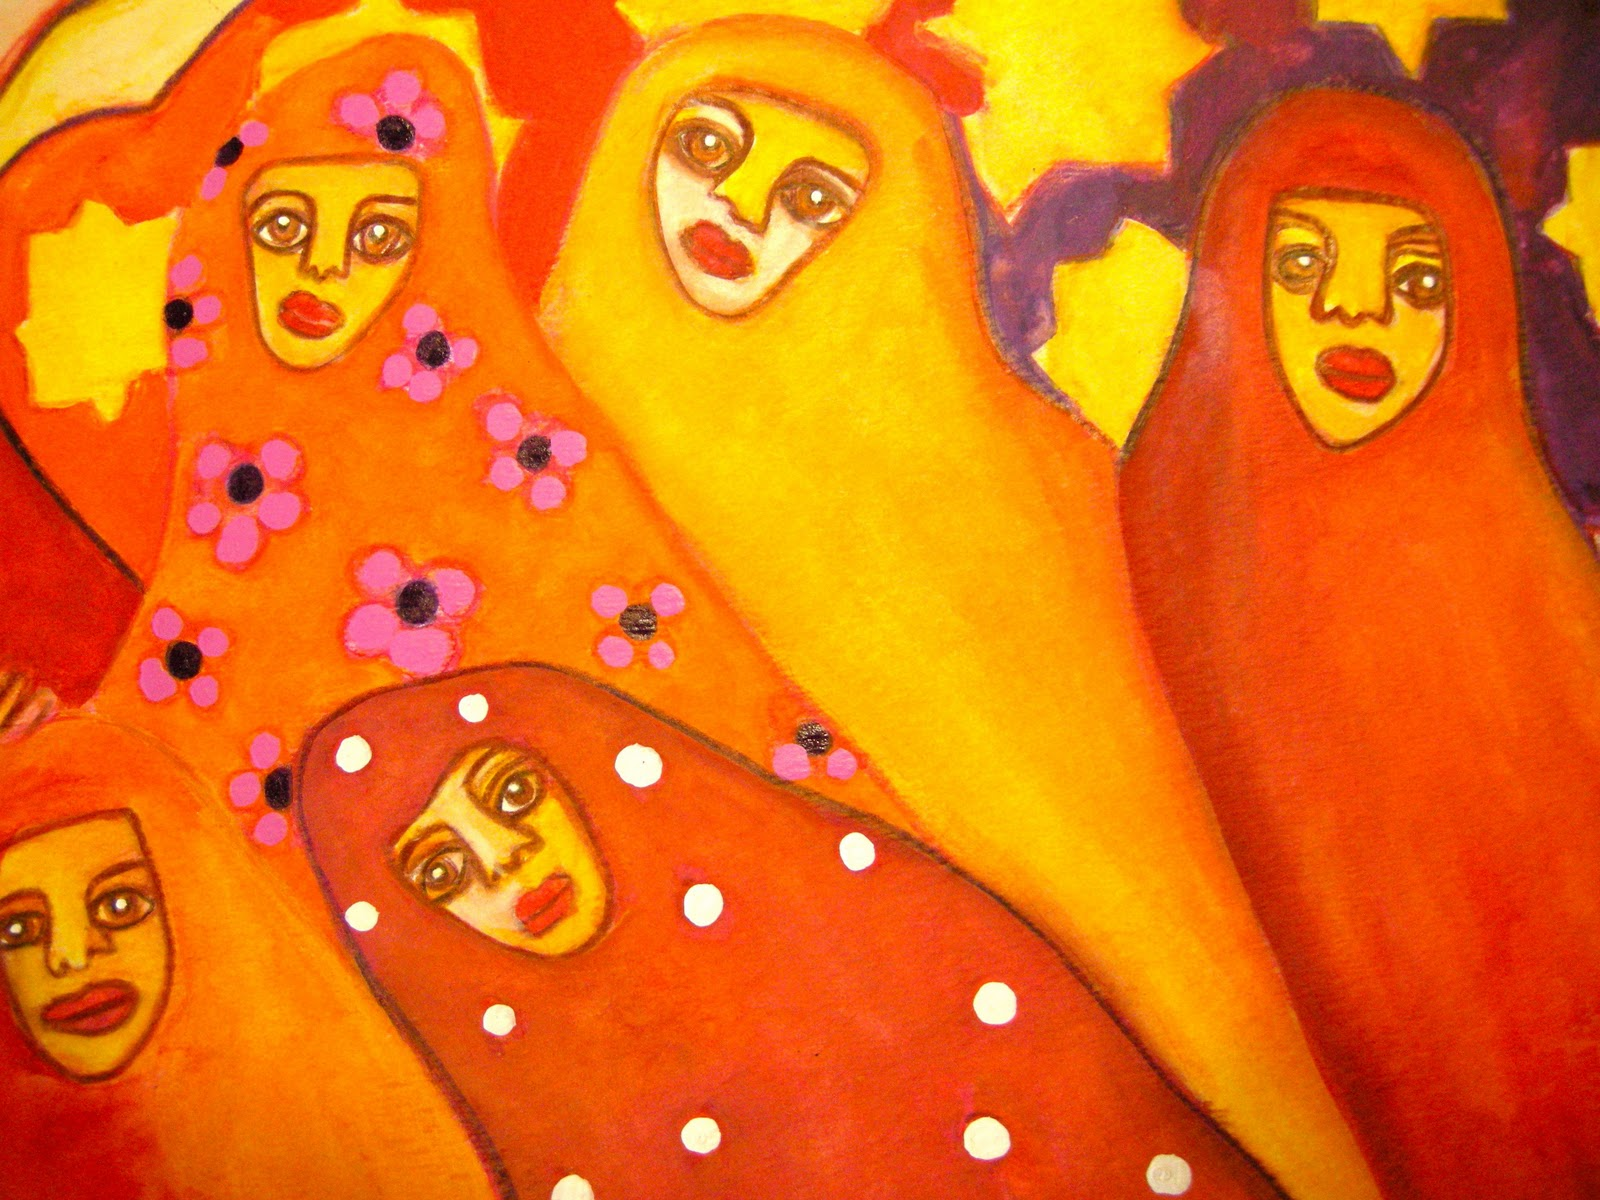 Art by Ruth Schowalter